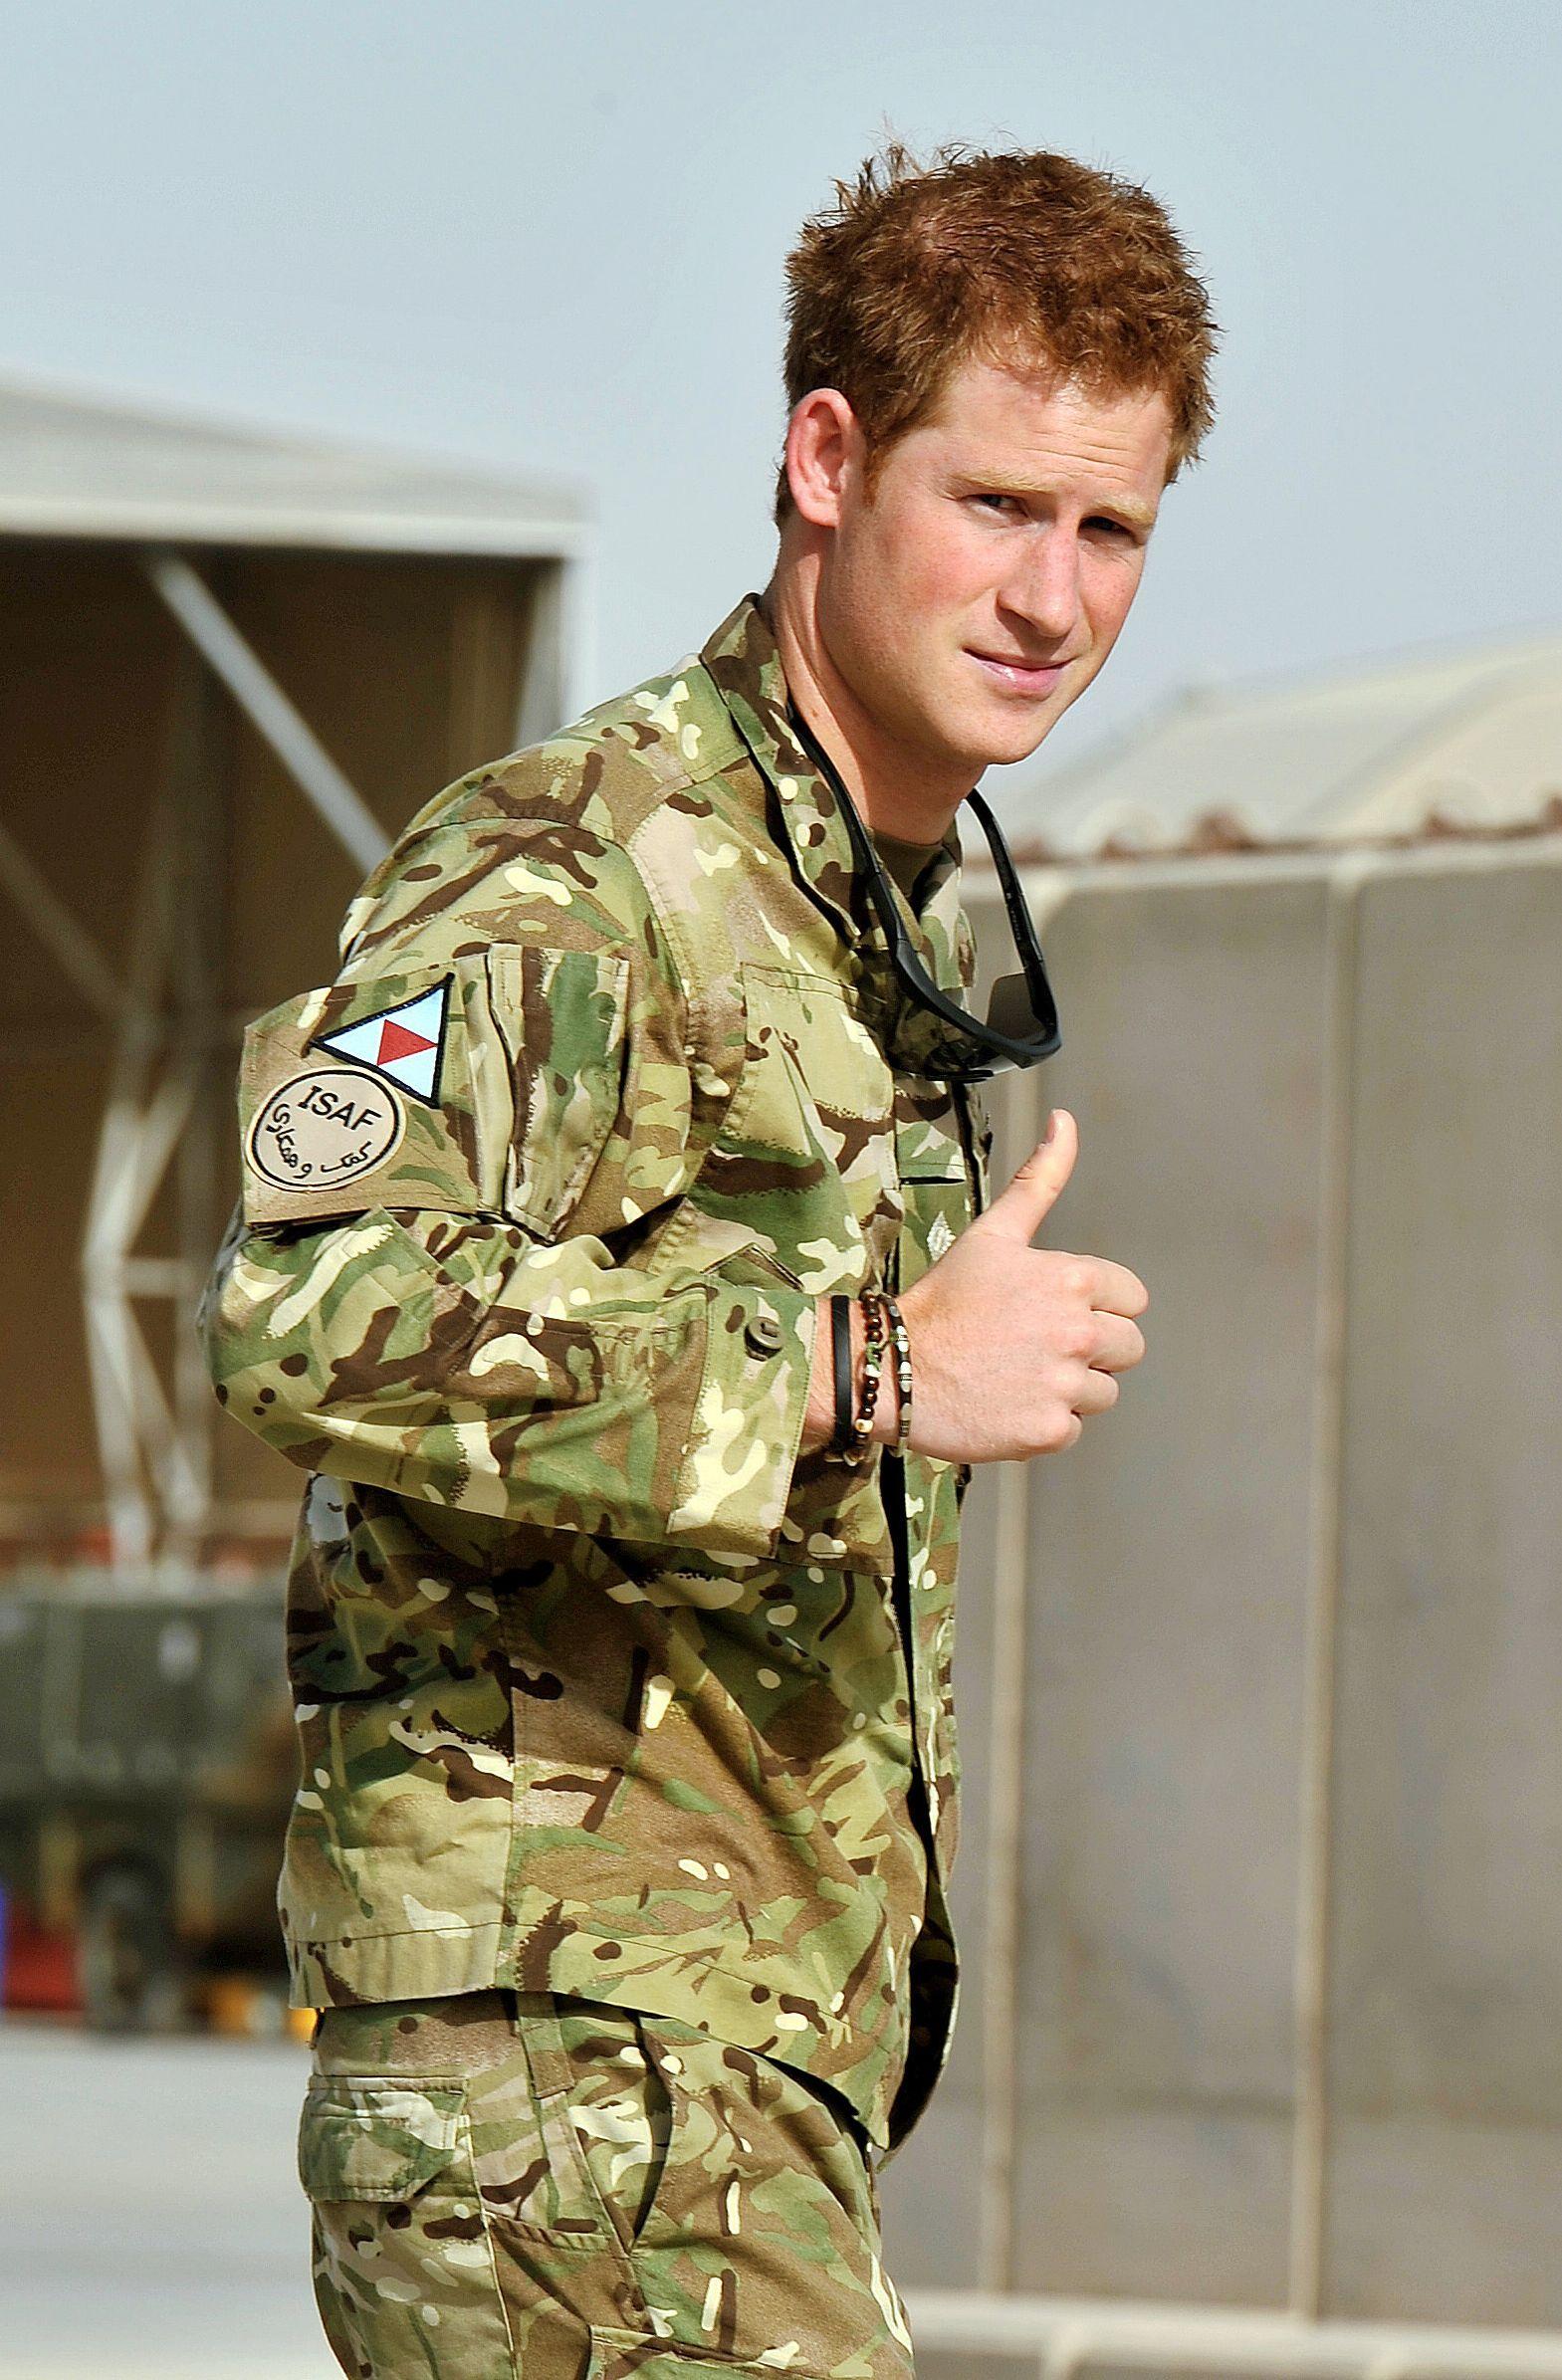 Le service en Afghanistan du prince Harry a pris fin lundi.